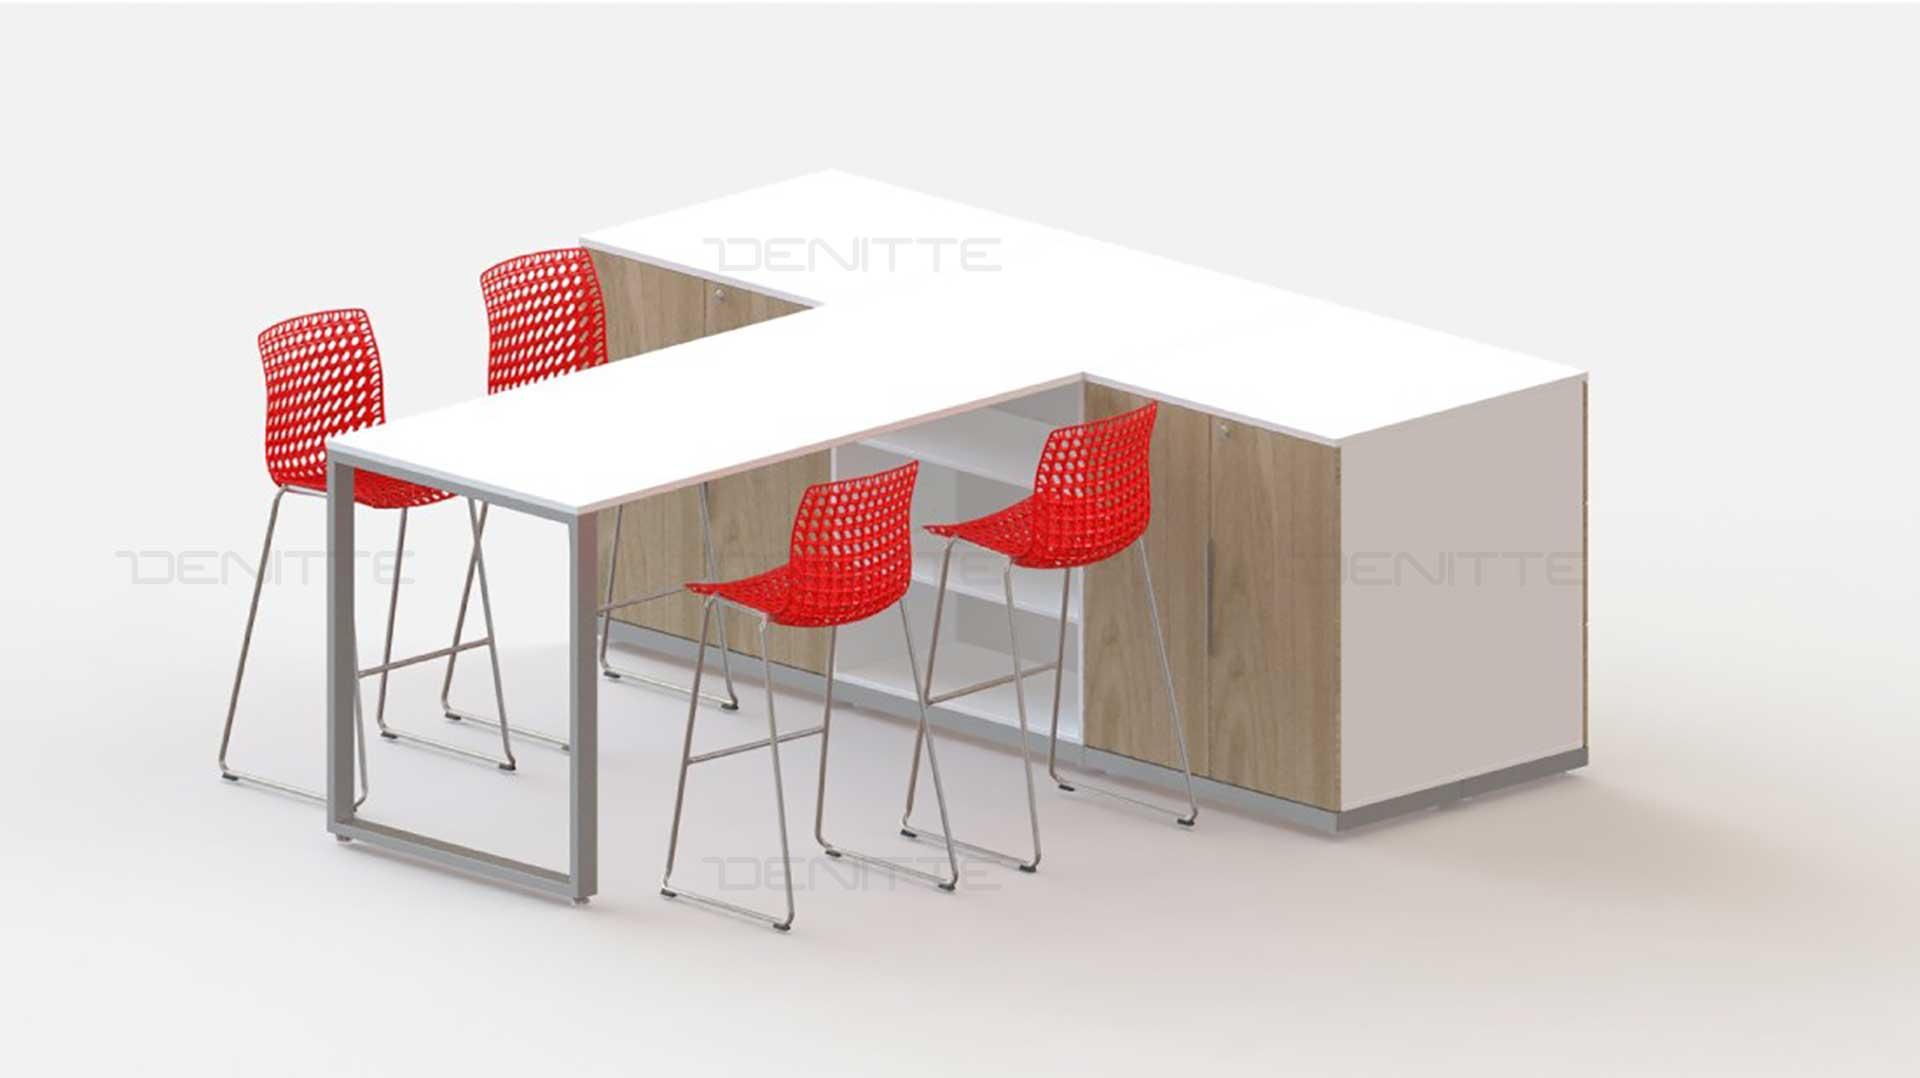 ساخت میز گروهی پالس